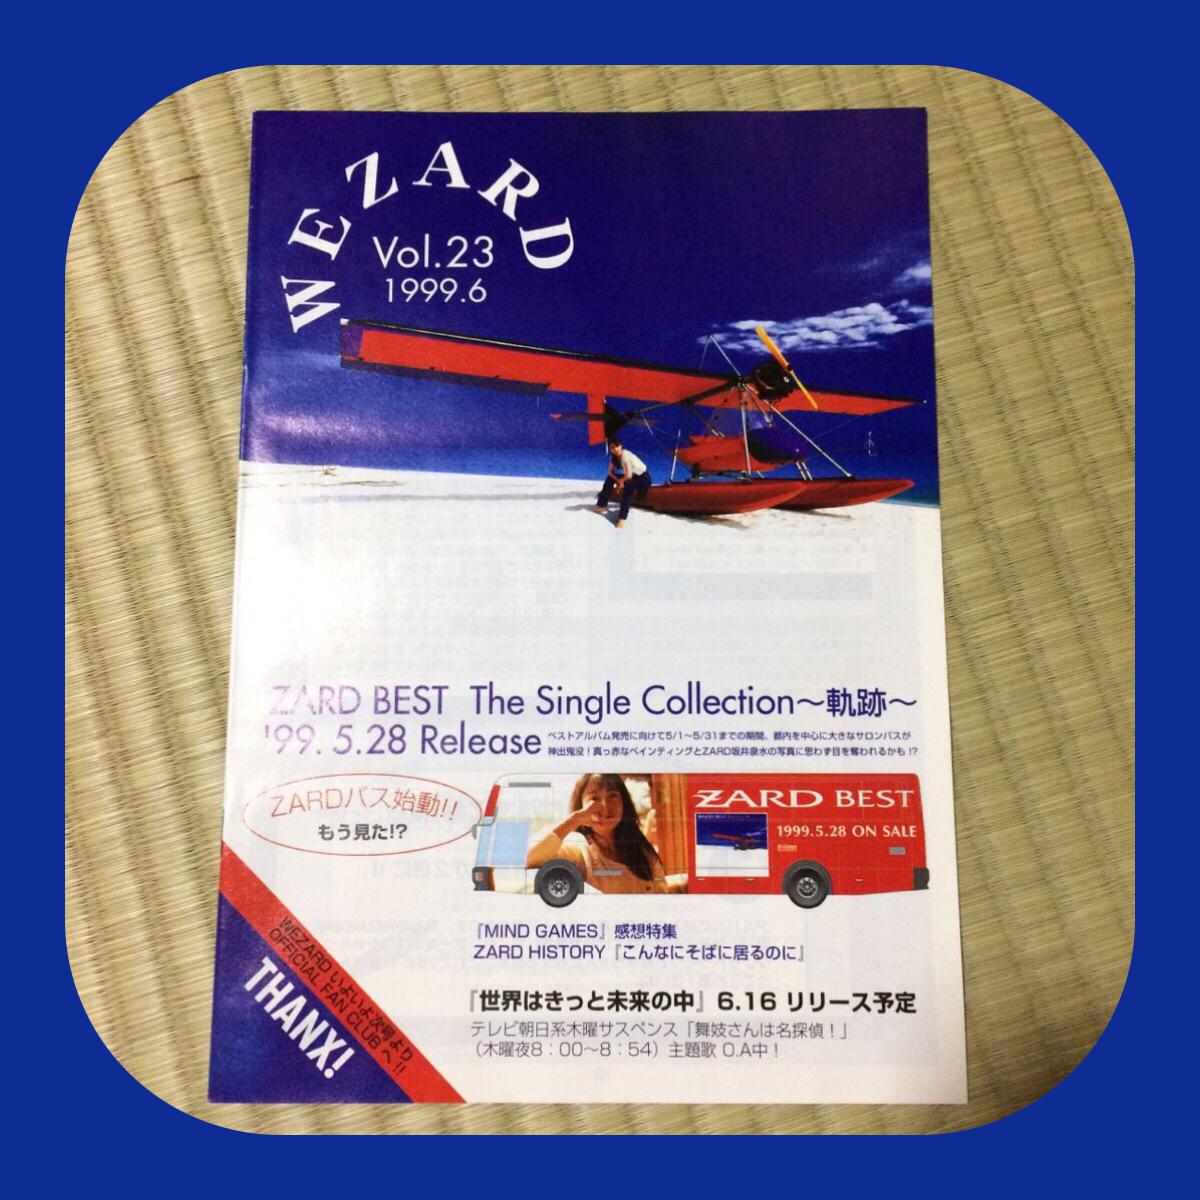 ■WEZARD■会報準備号 Vol.23号■ZARD■FC限定■ファンクラブ■レアグッズ 坂井泉水